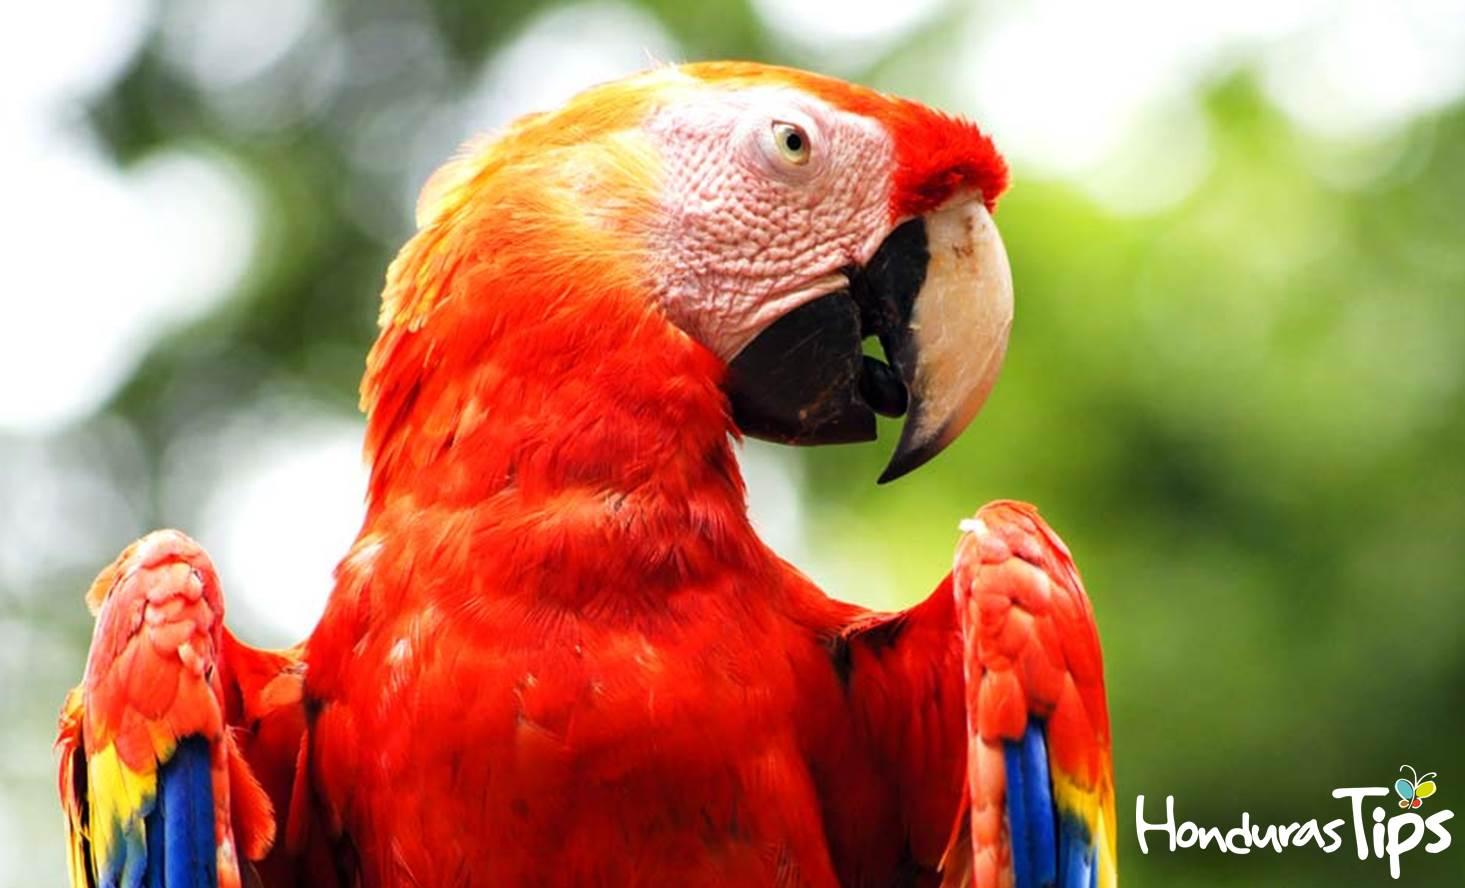 Guara o Guacamaya Roja, el ave nacional de Honduras.